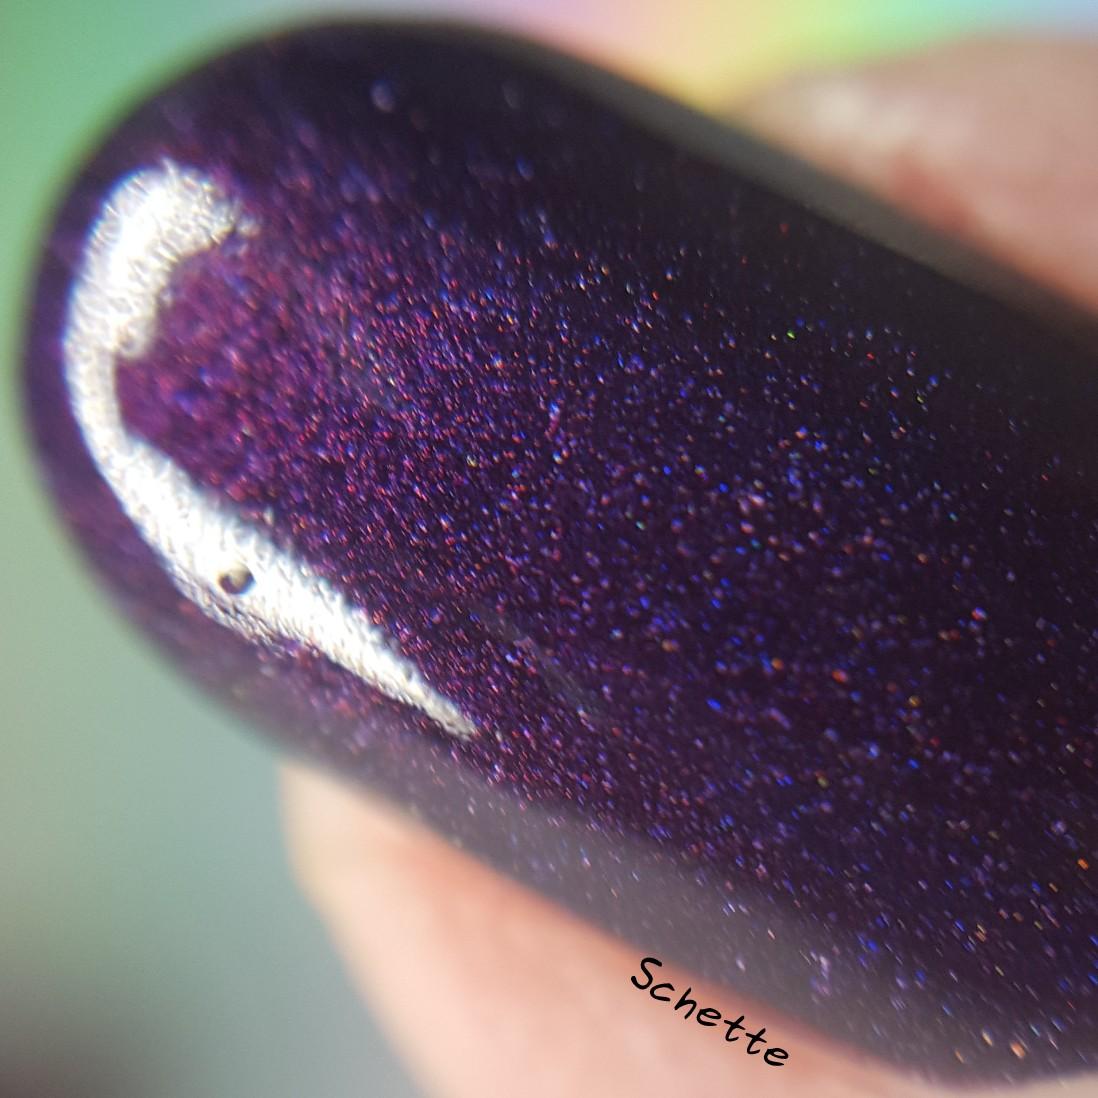 Lilypad Lacquer - Plum Pudding